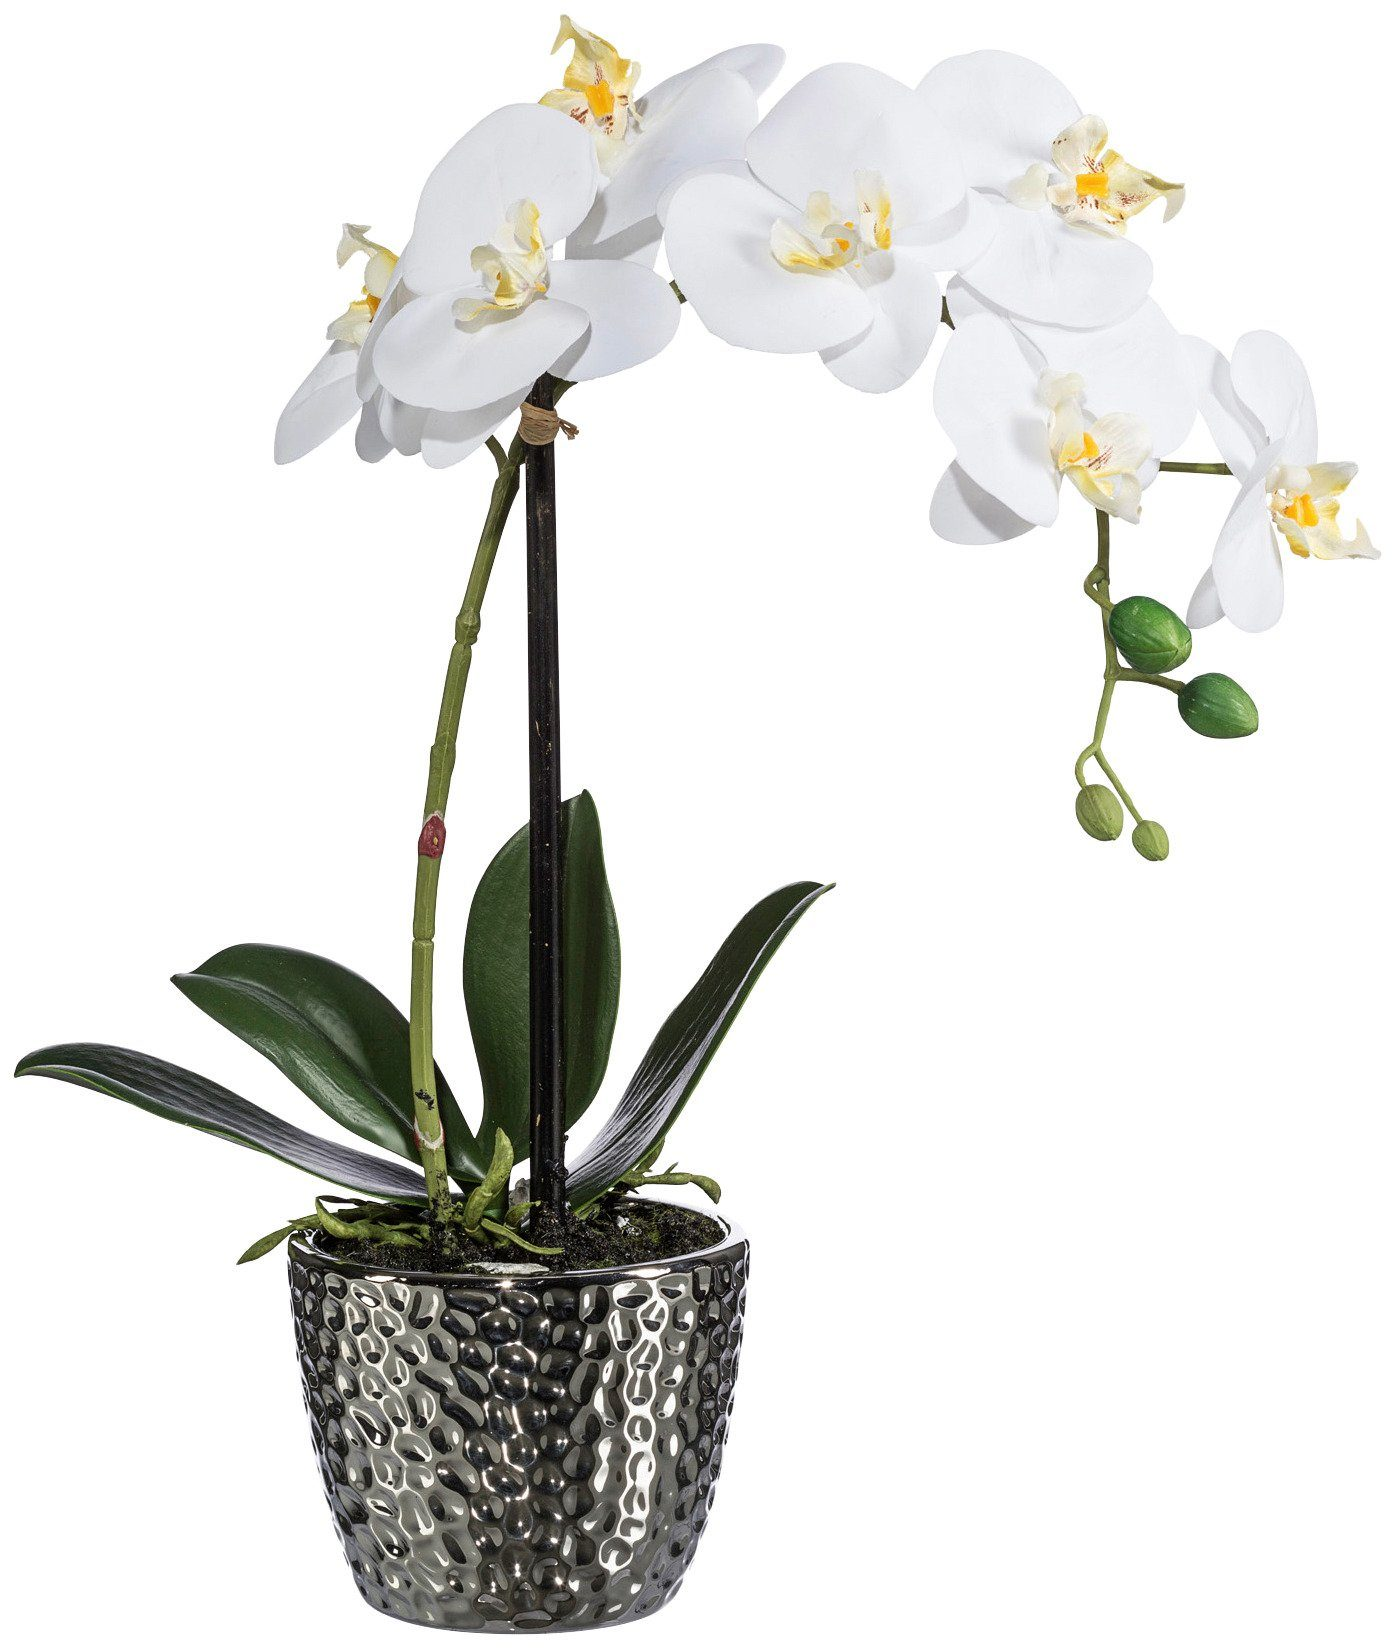 Kunstpflanze »Orchidee« weiß inkl. Pflanzgefäß (H: 45 cm)